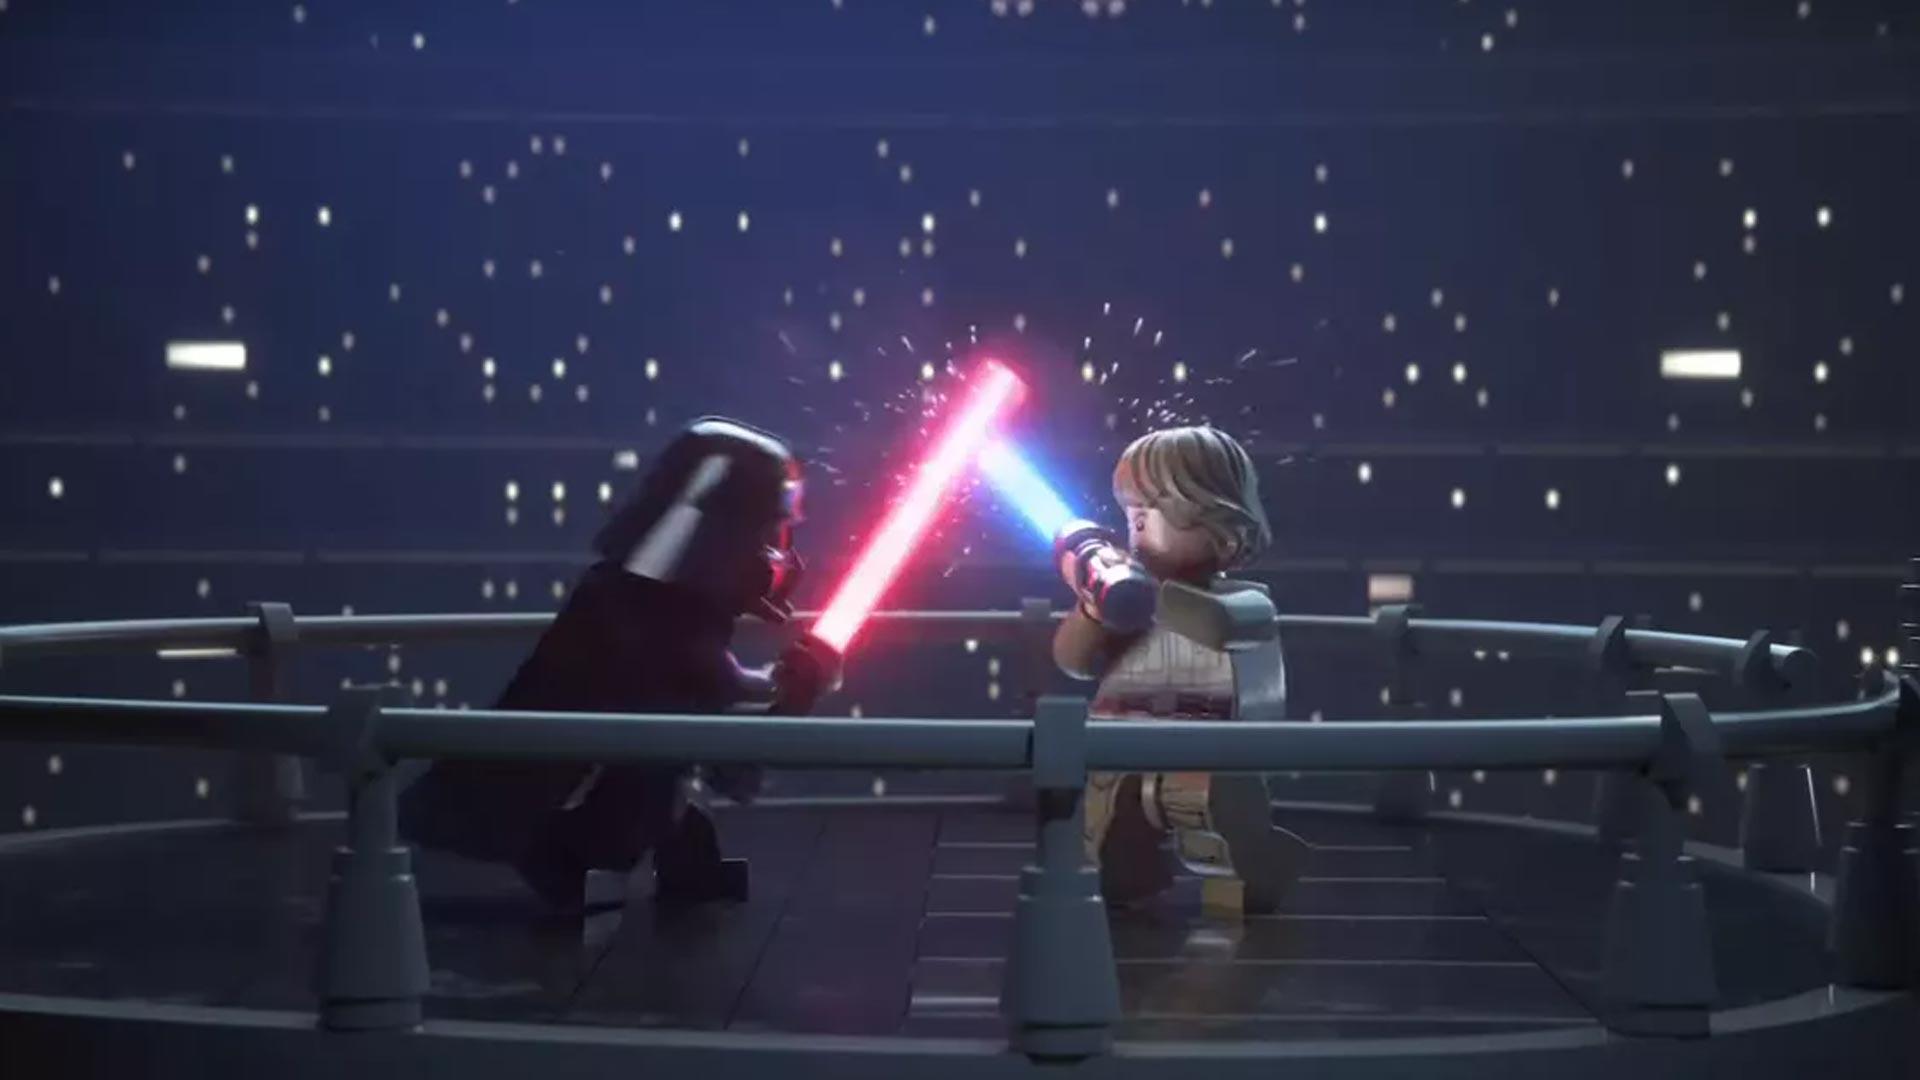 LEGO Star Wars: The Skywalker Saga 2020